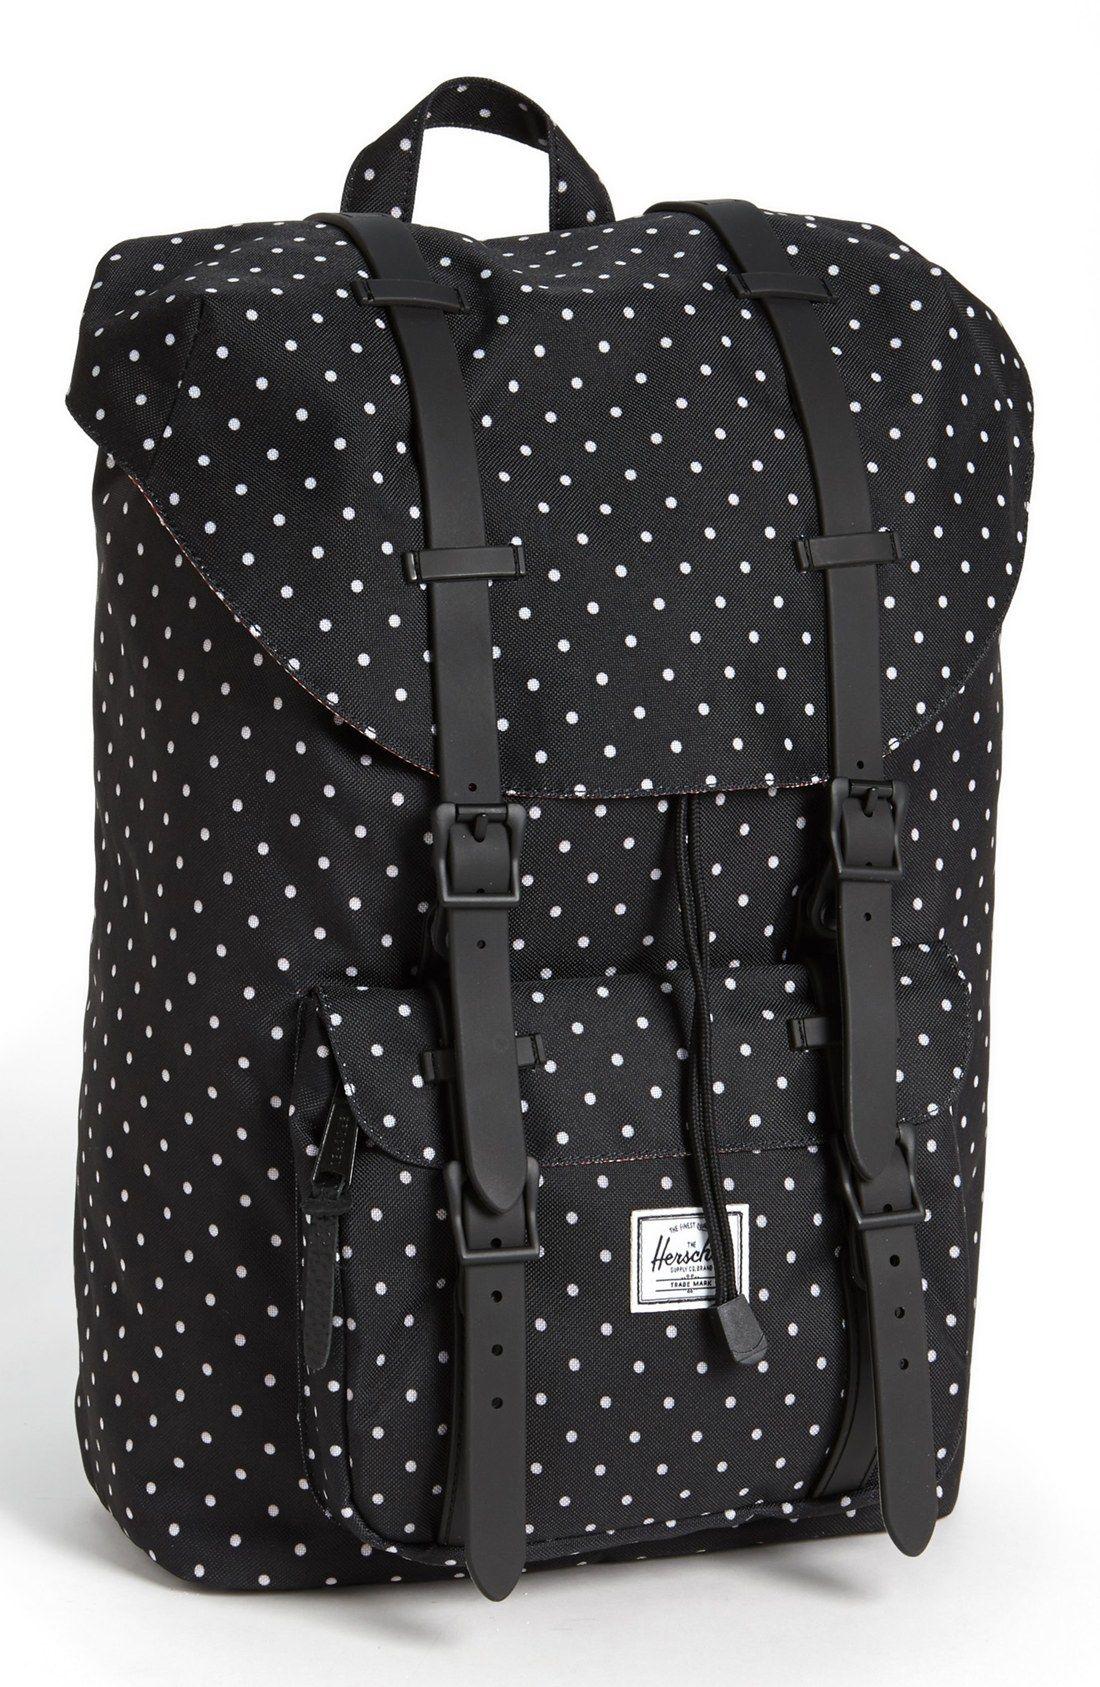 ab72864d8e Polka Dot Backpack - Herschel Supply Co.